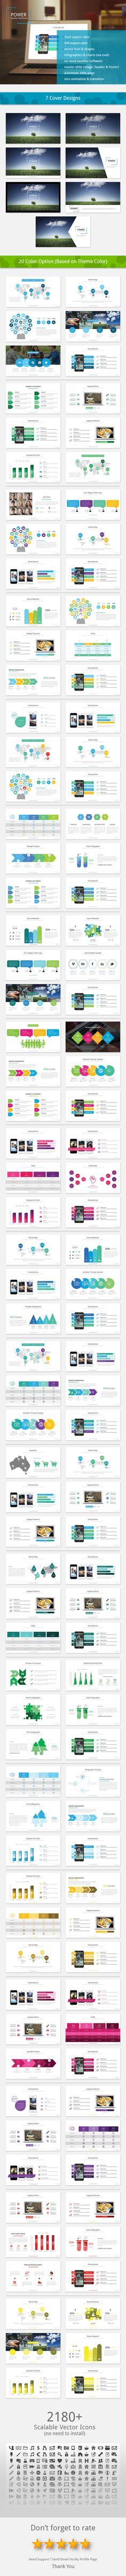 PowerPoint Presentation Template #slides Download: http://graphicriver.net/item/power-presentation-template-vol-4/13402903?ref=ksioks